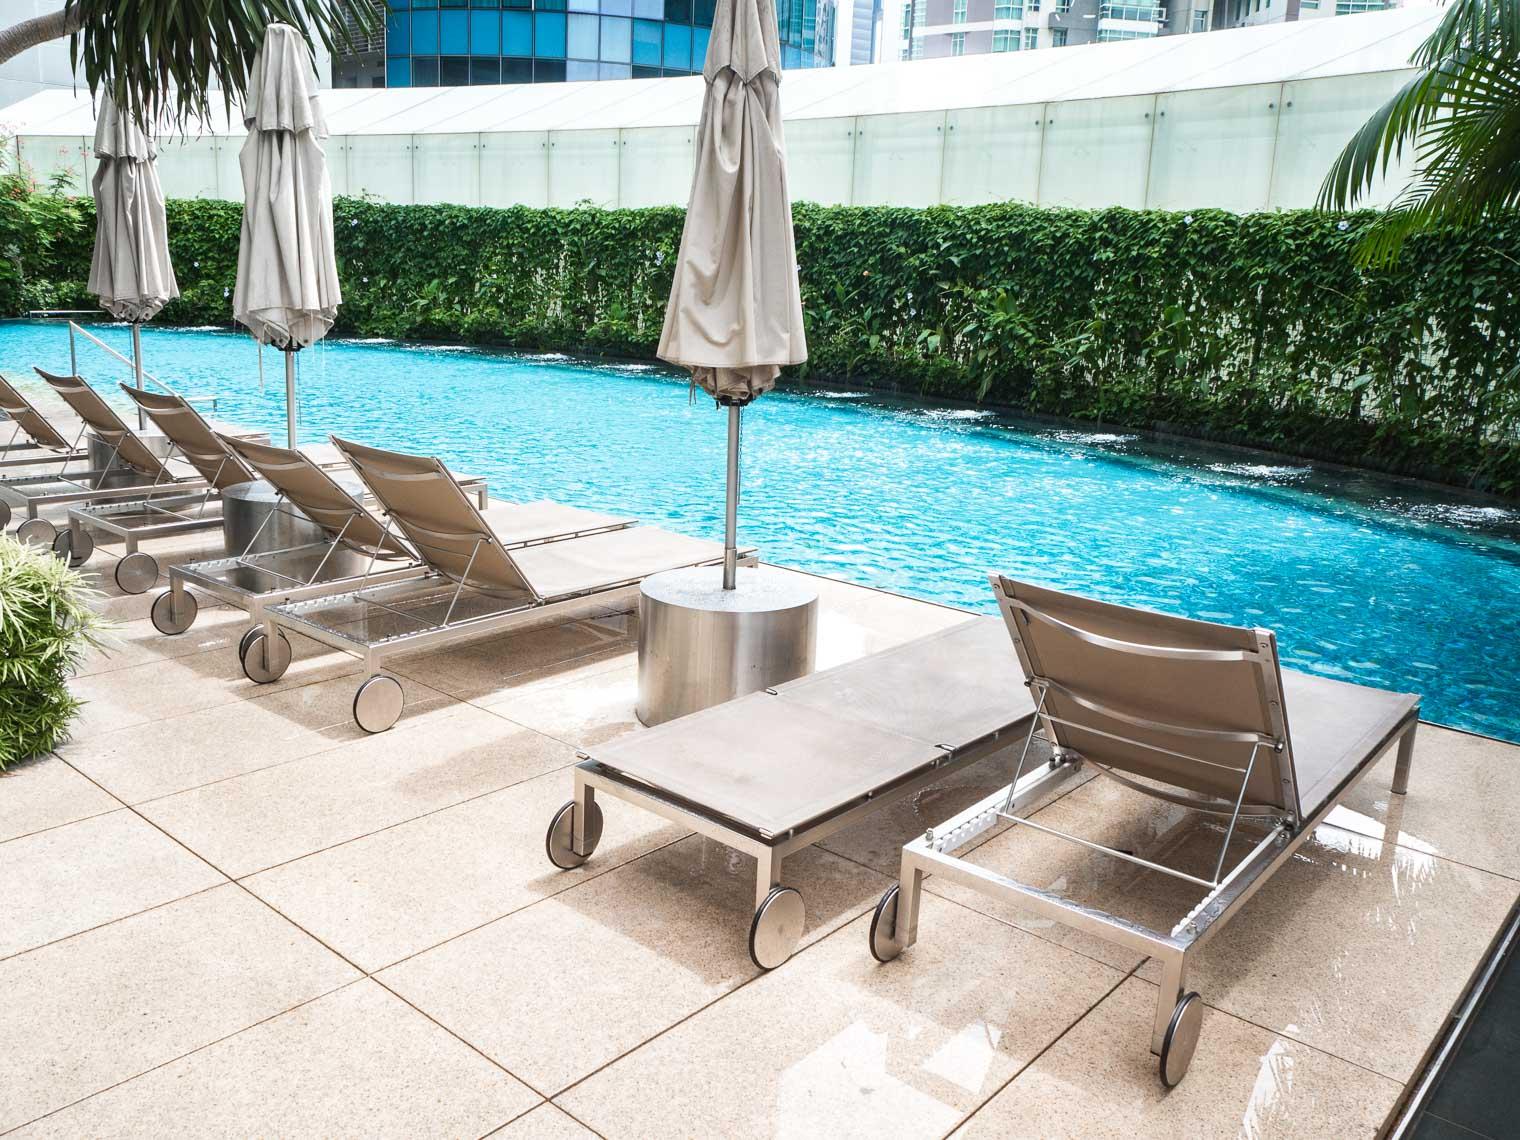 Swimming pool at St Regis hotel Singapore